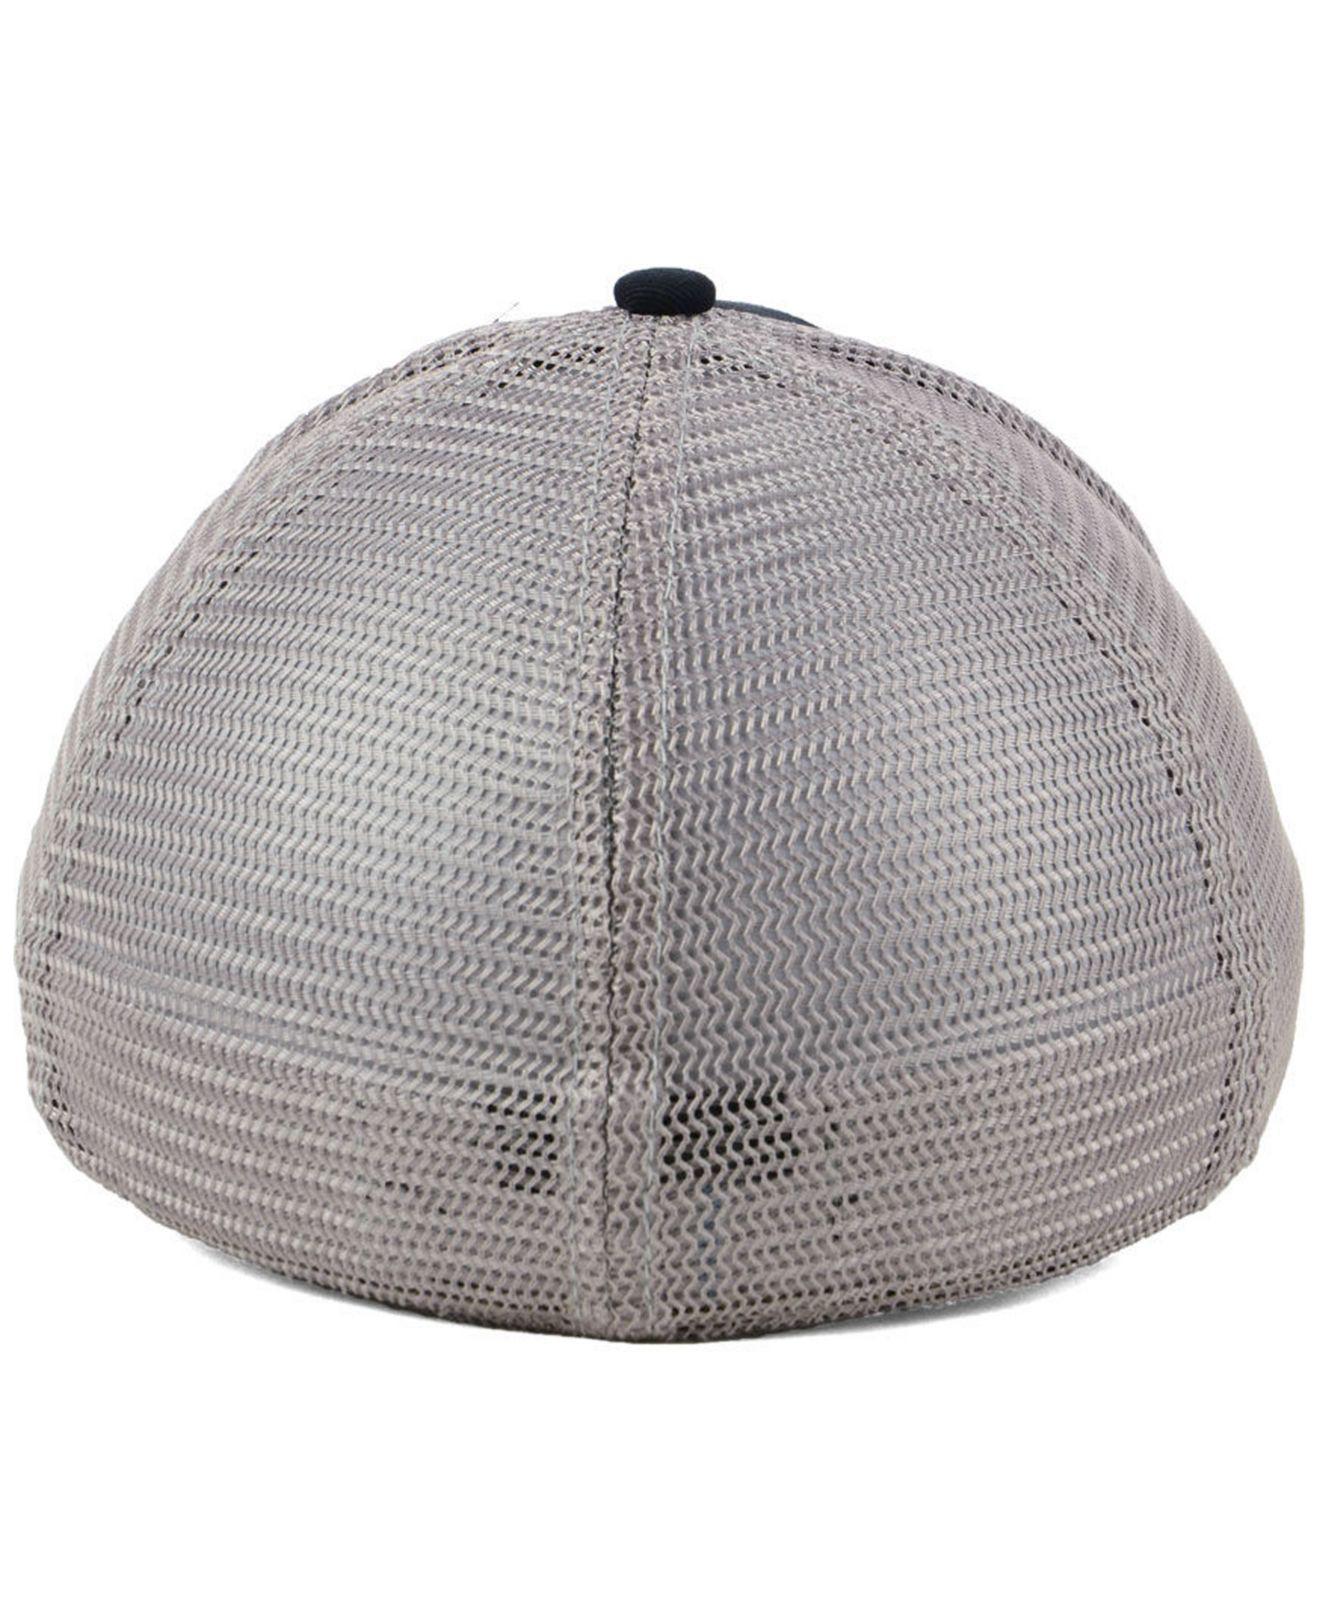 detailed look 0a6dc db883 ... shopping adidas black los angeles football club mesh flex cap for men  lyst. view fullscreen